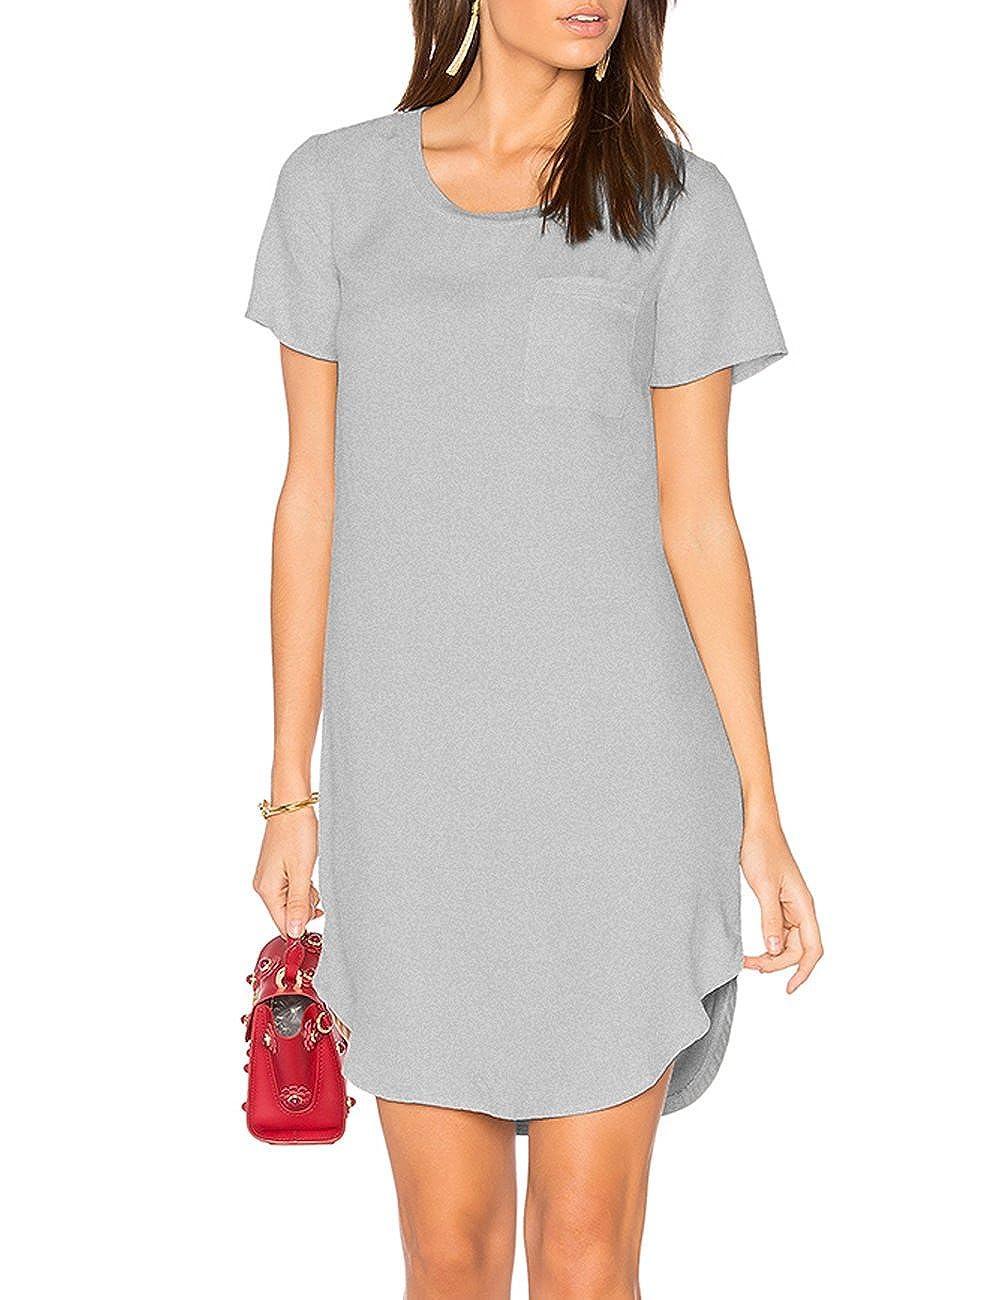 c1763df684fd Top1  ALLY-MAGIC Women s Tunic Casual Plain Simple Short Sleeve T-Shirt  Dress